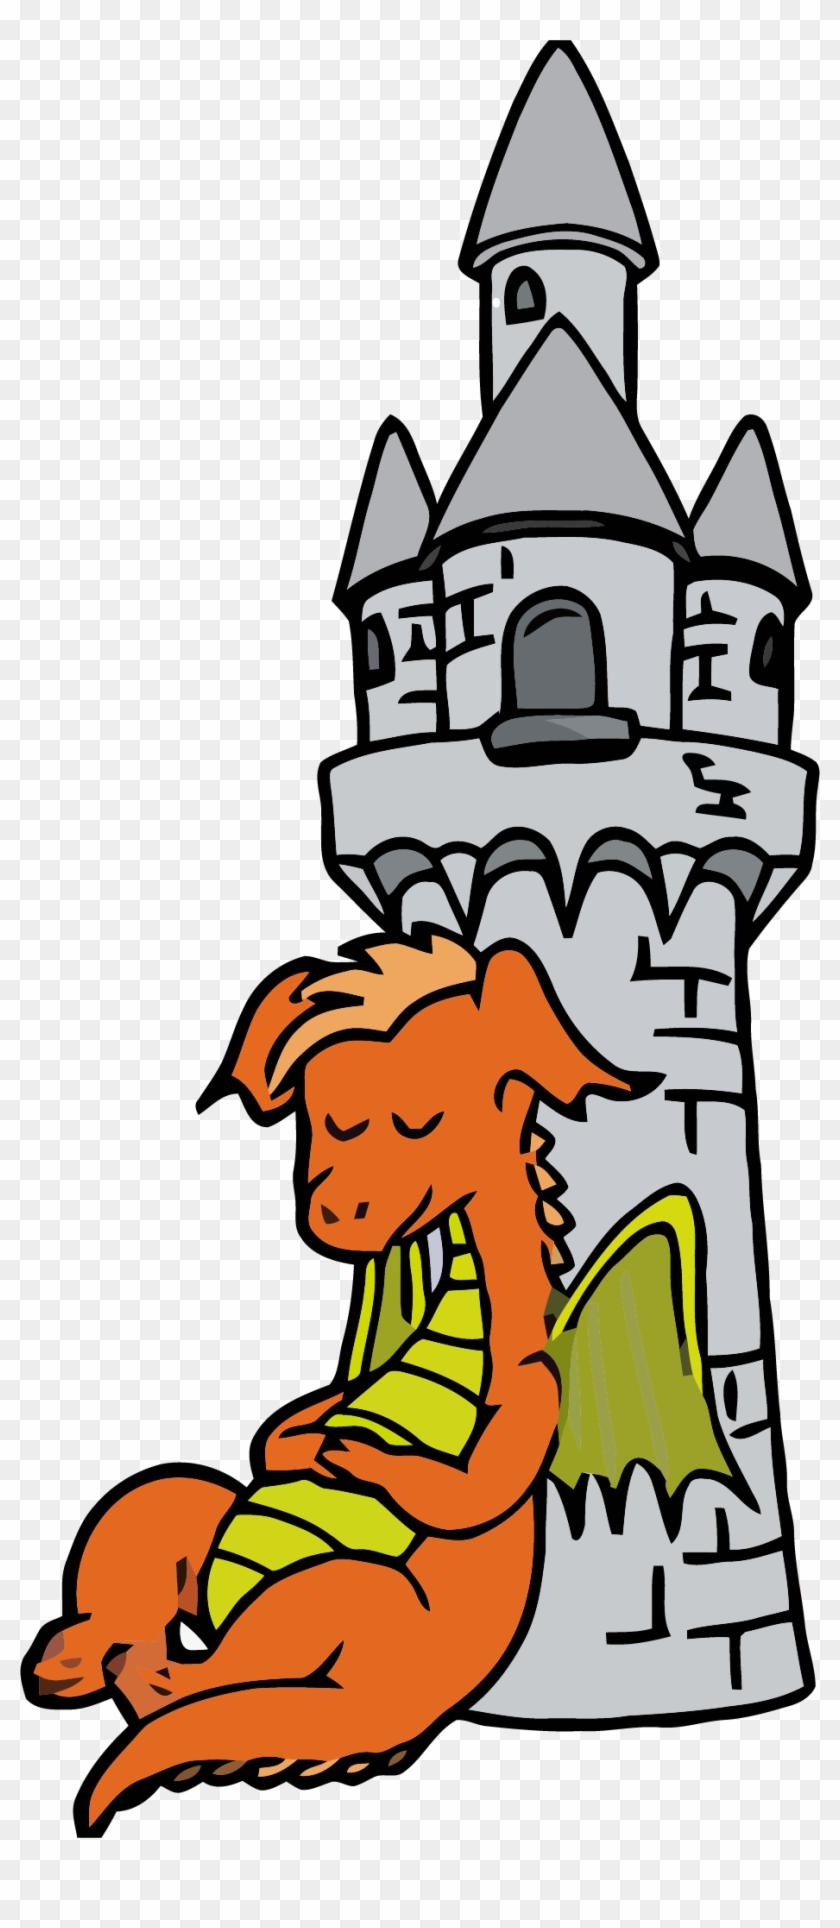 Brave Knight Slaying A Dragon - Clip Art #25992